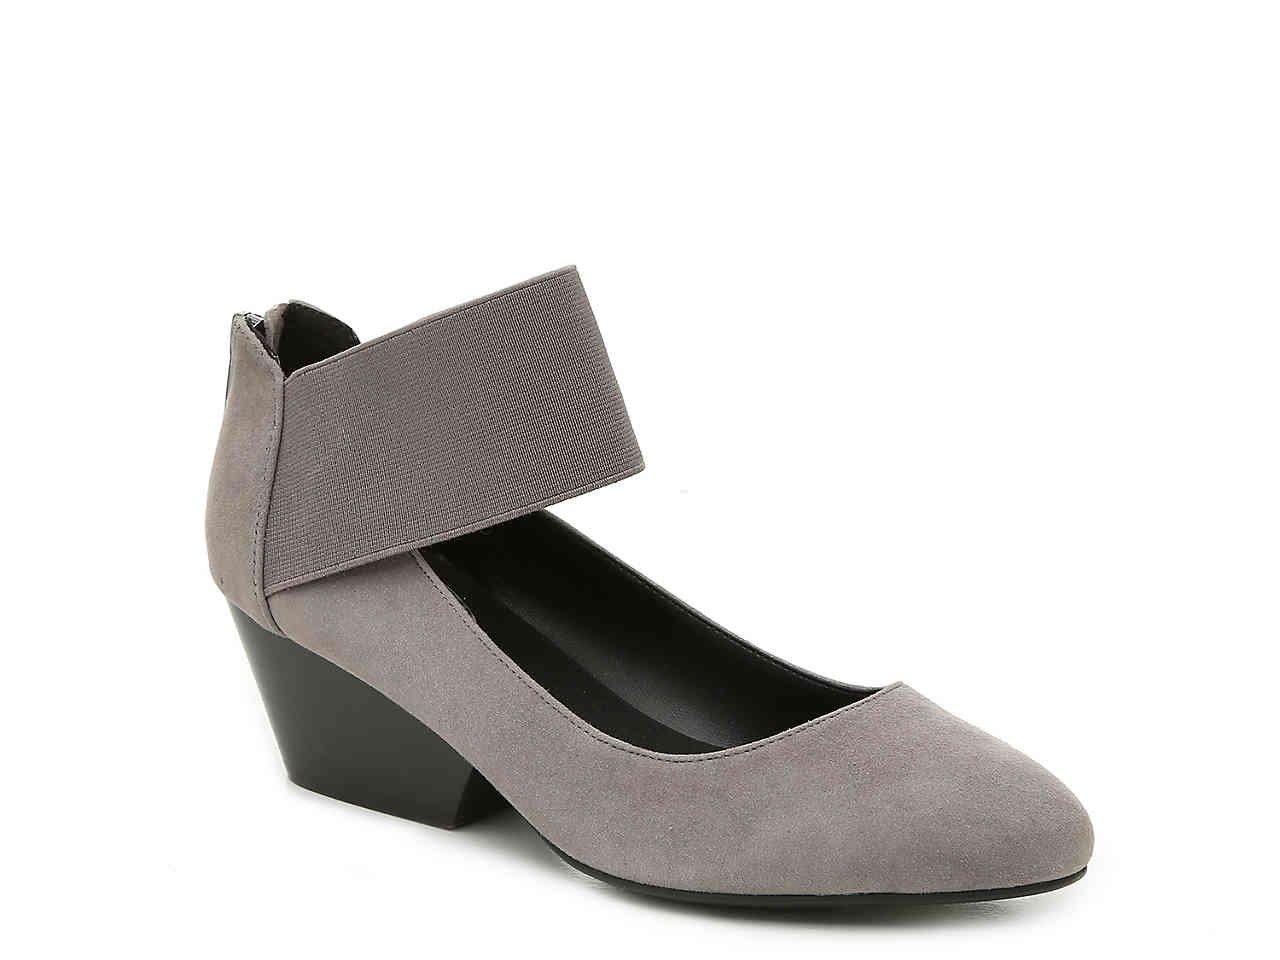 COM & SENS Pomaro Pump Women's Shoes | DSW